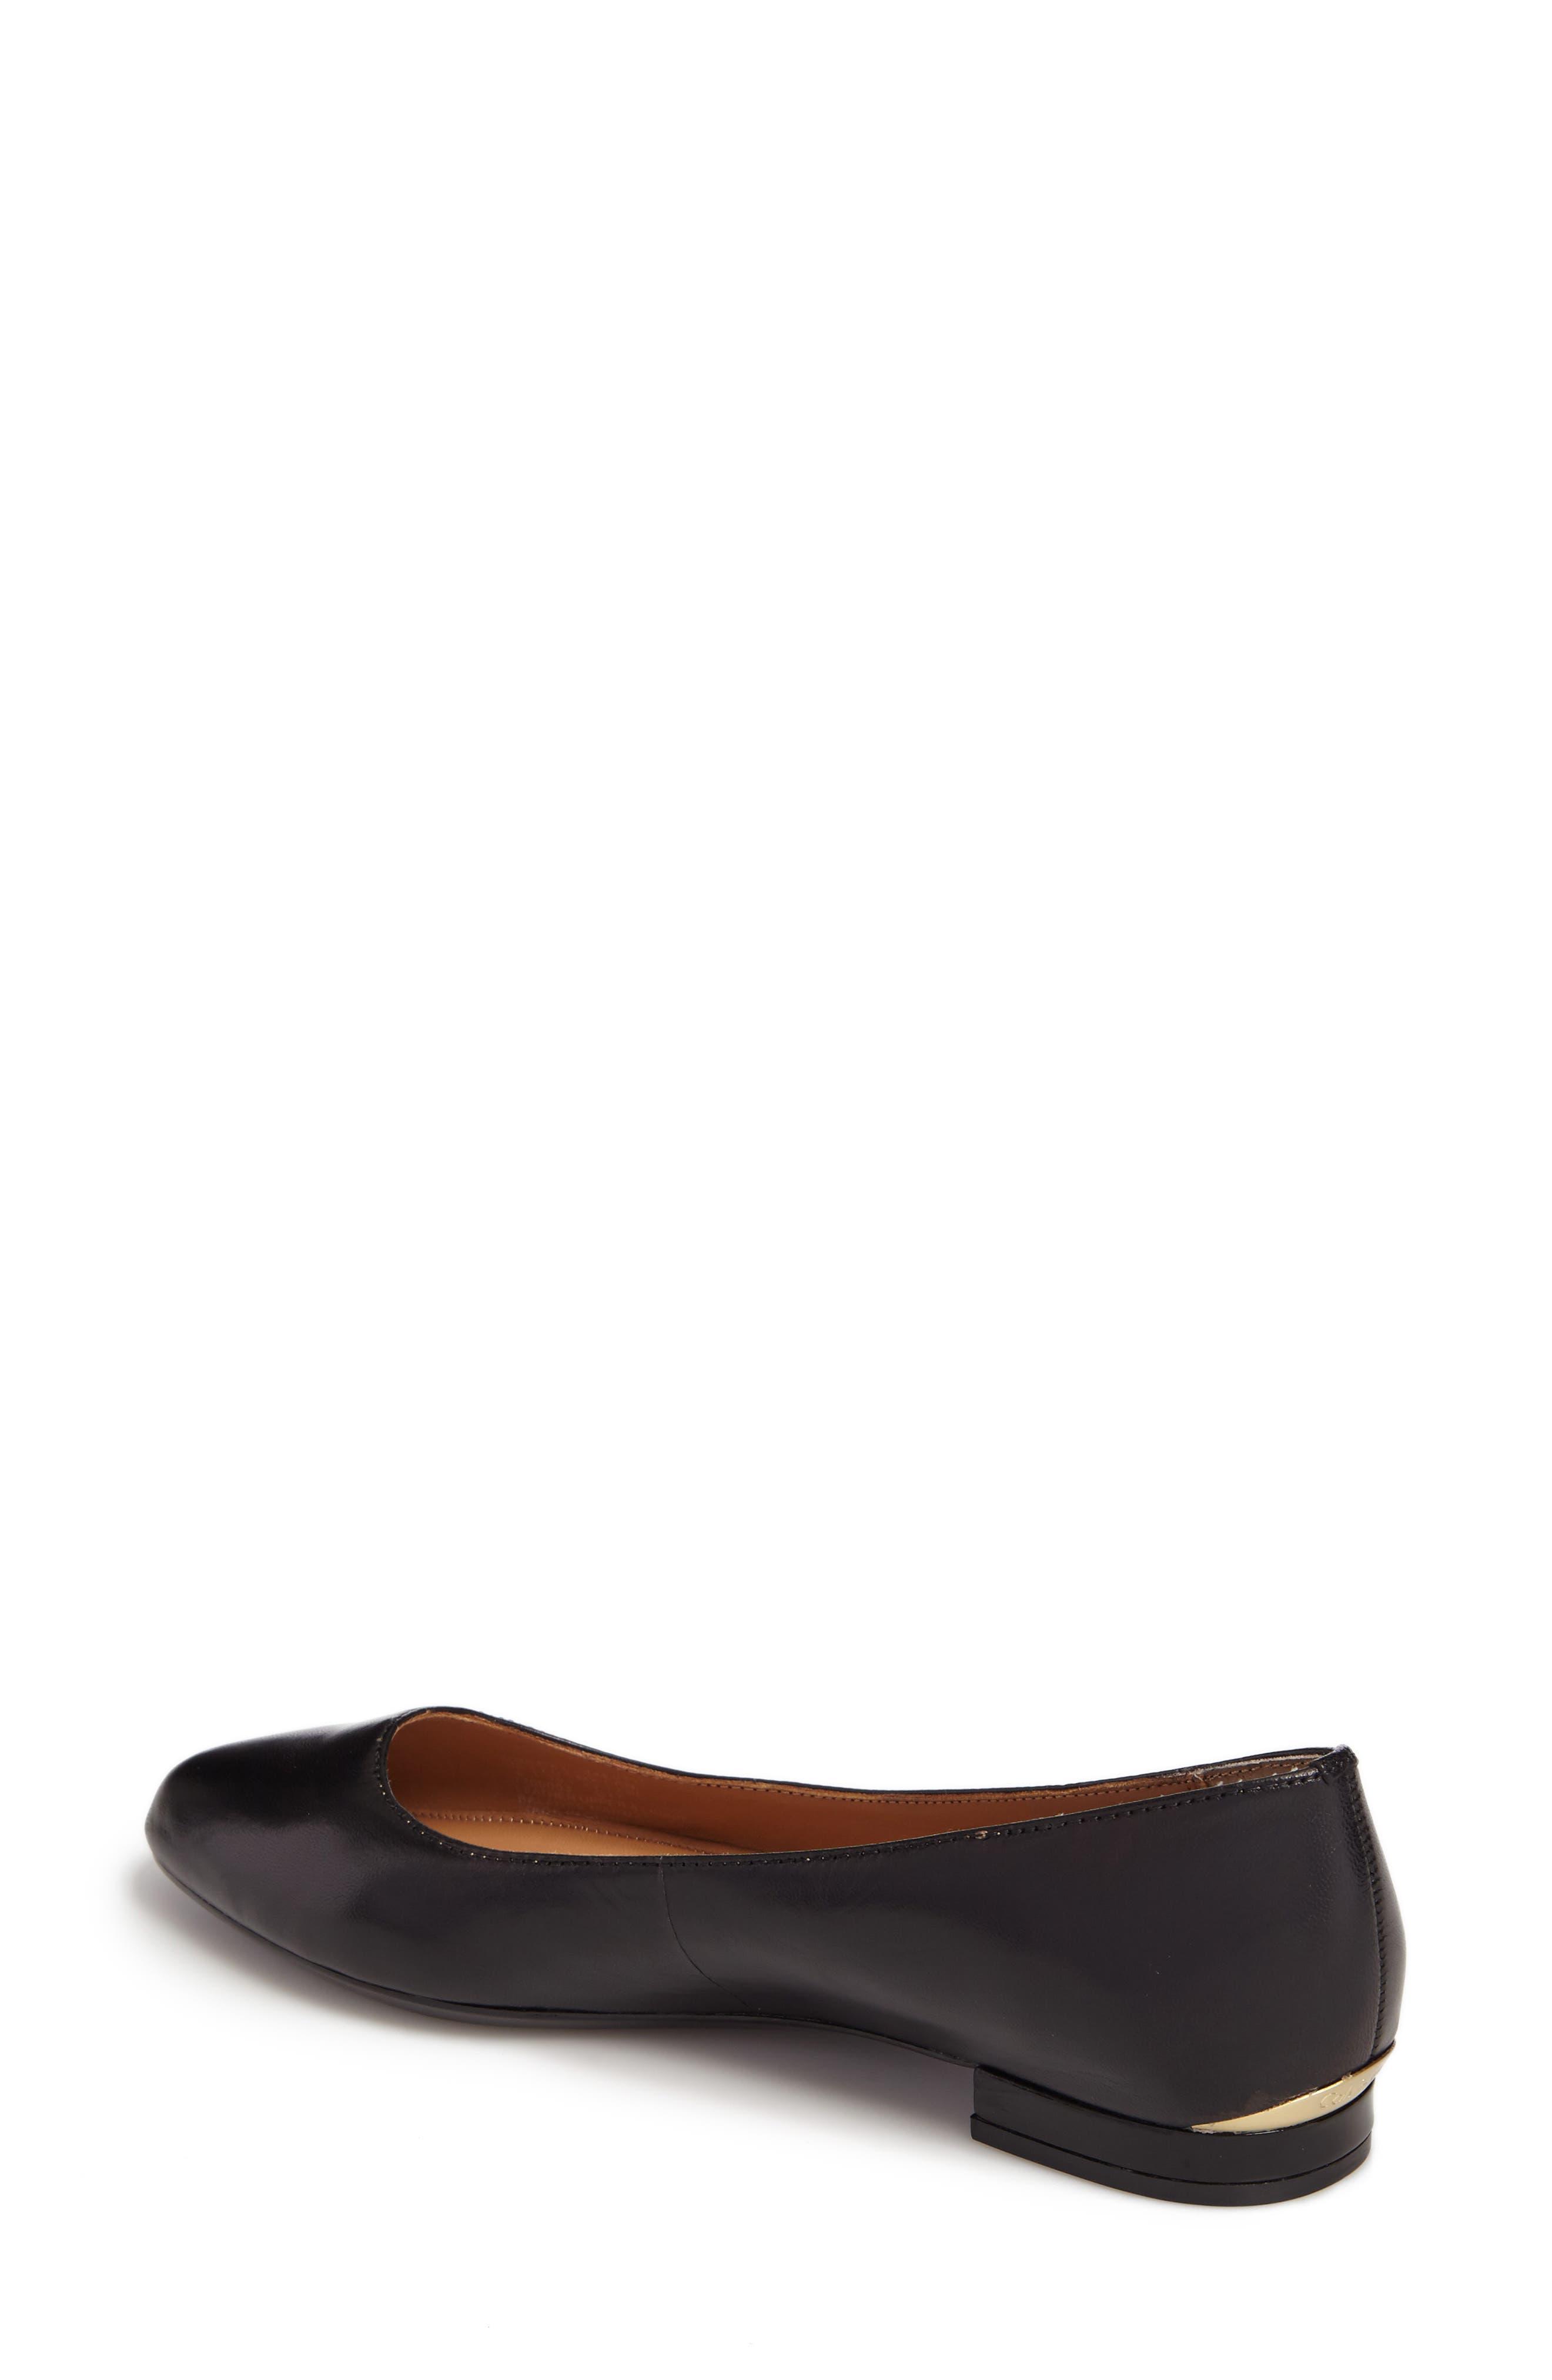 Gredel Flat,                             Alternate thumbnail 2, color,                             Black Leather